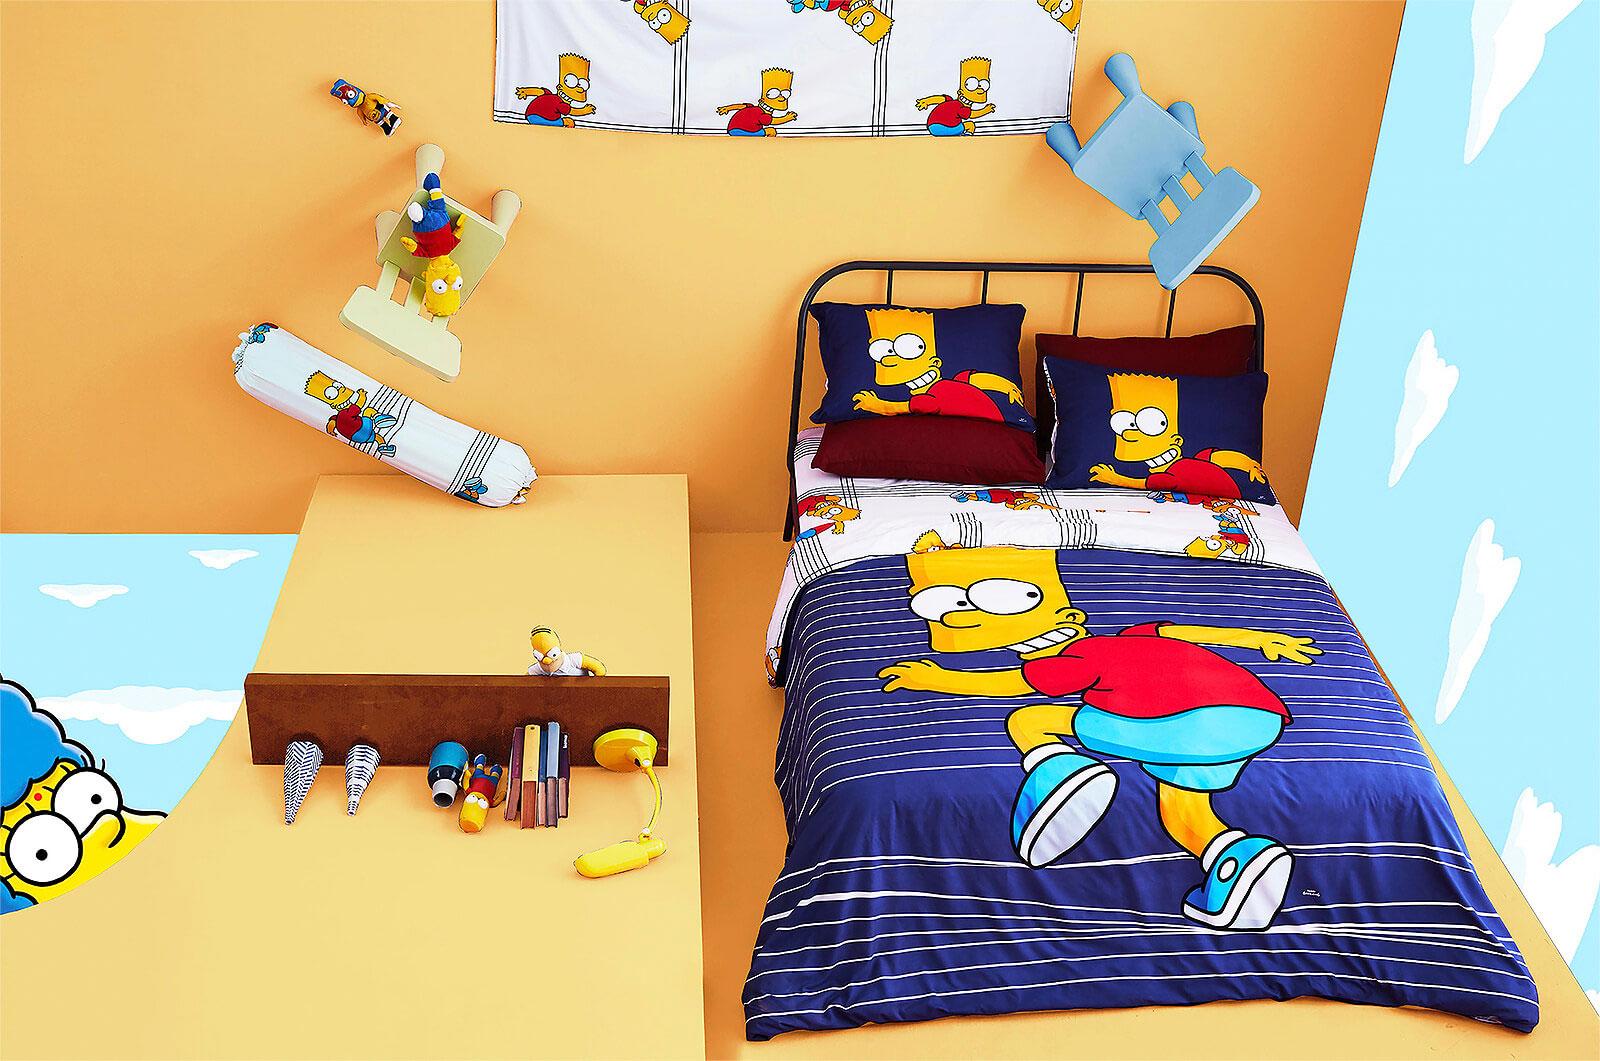 Lotus รุ่น Pop-art The Simpsons ชุดผ้าปูที่นอน LI-SS-01